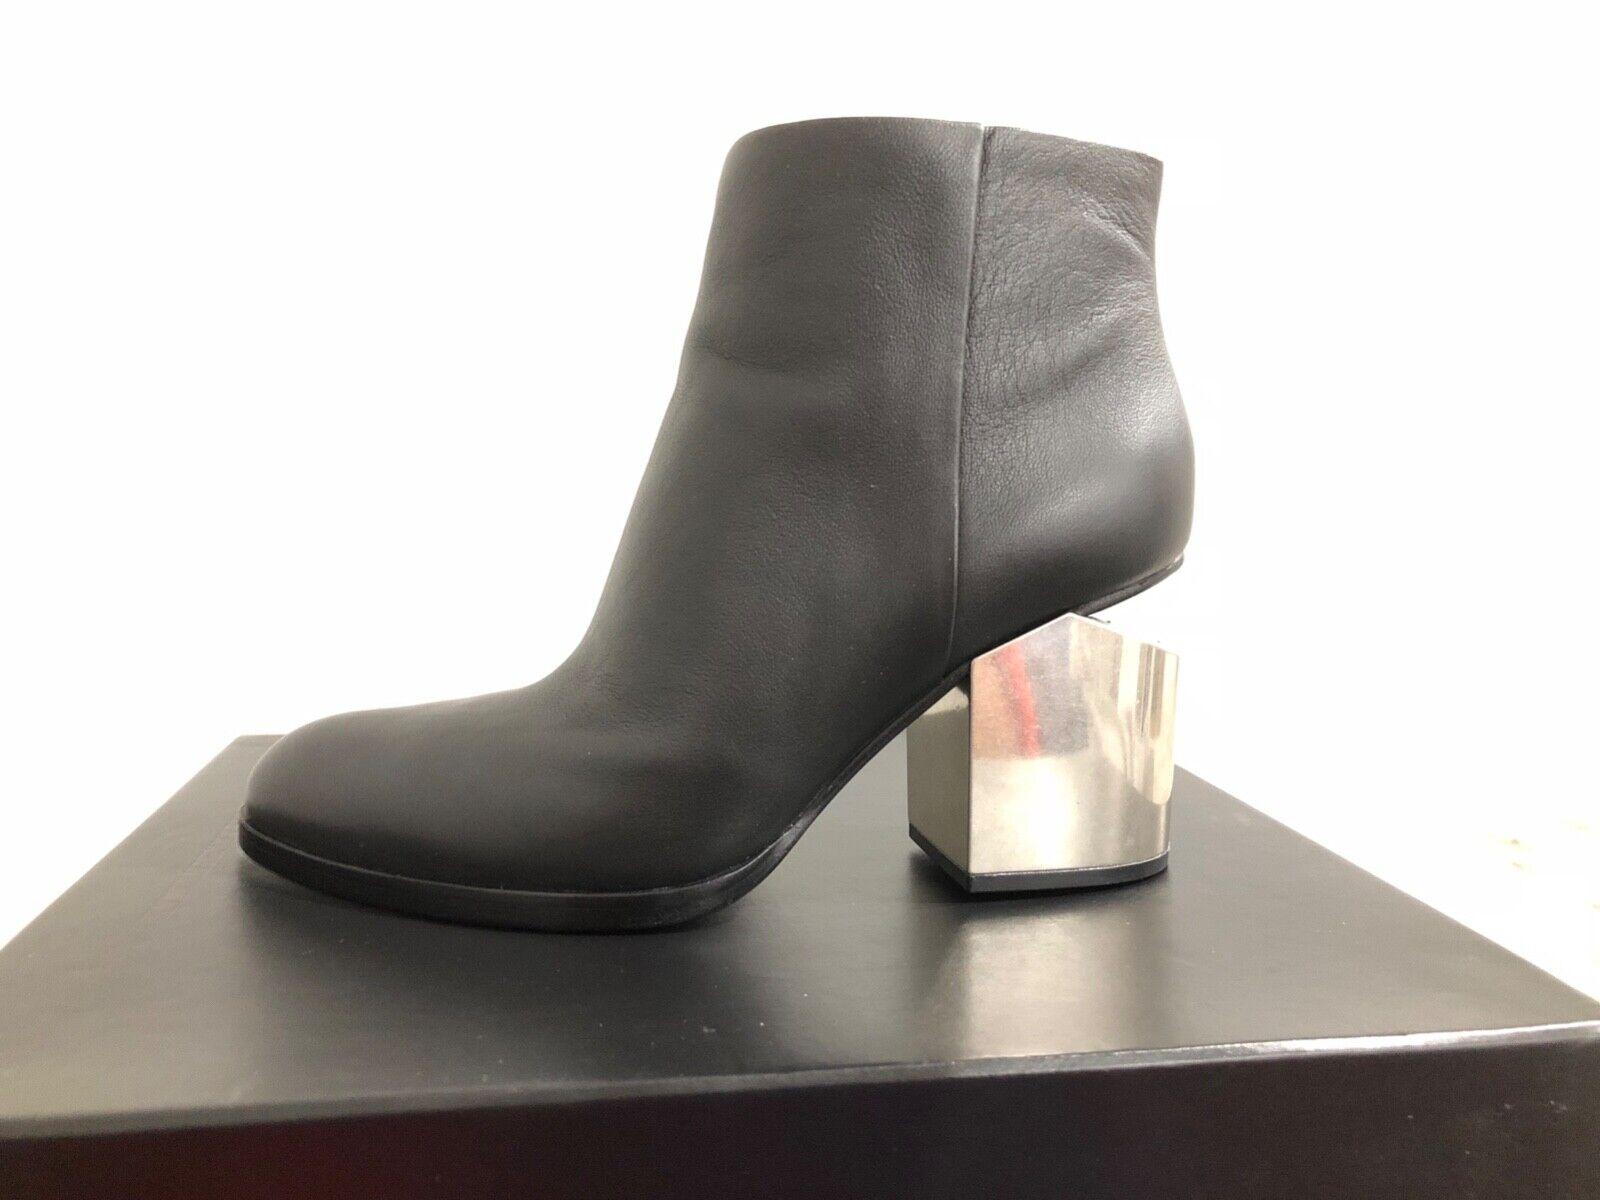 New Alexander Wang Gabi Boots Booties with Silver Metal Heel Size 39 US 9